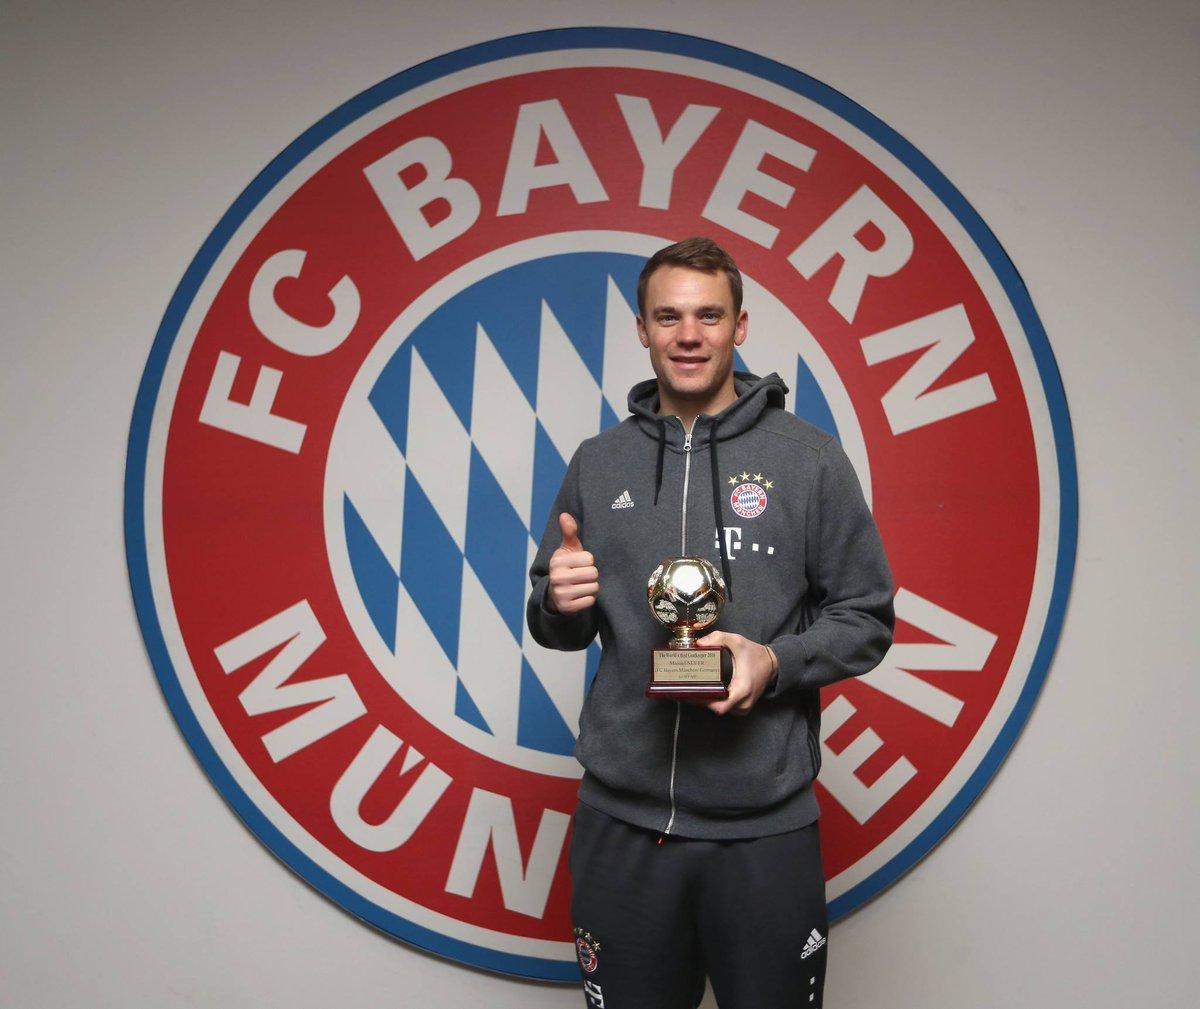 World's Best Goalkeeper 🥇 2013 ✔️ 2014 ✔️ 2015 ✔️ 2016 ✔️ https://t.co...